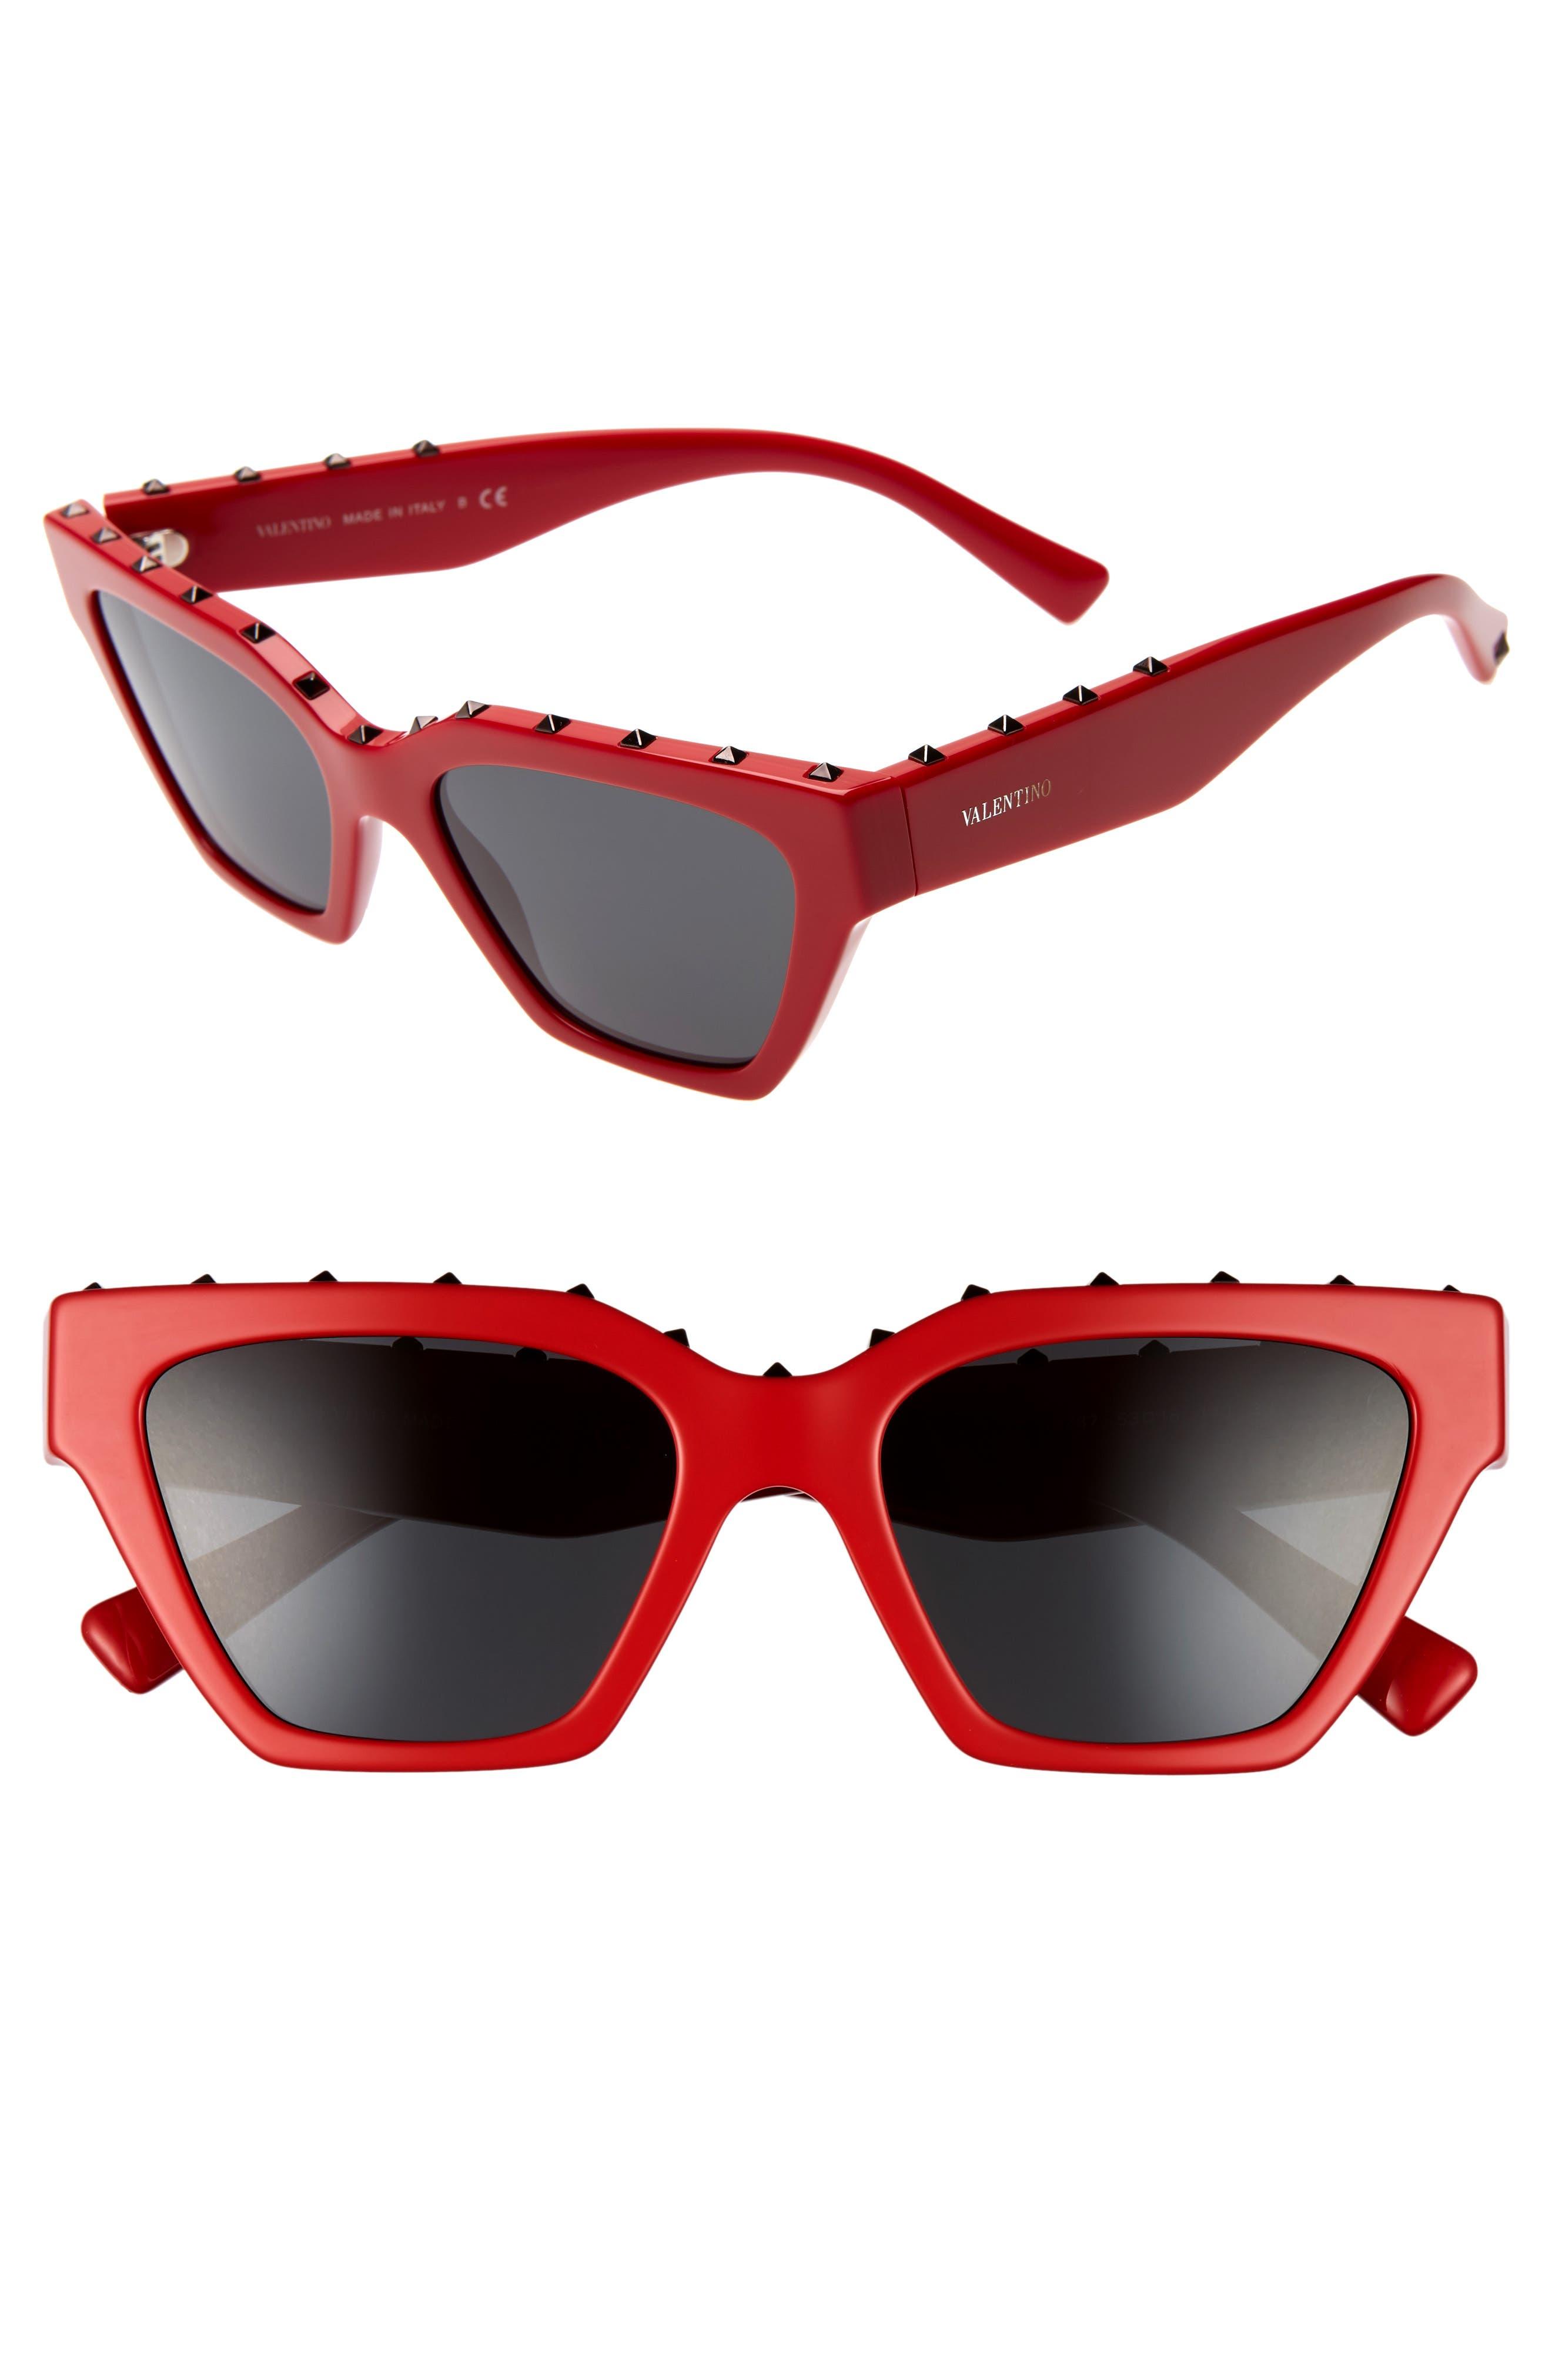 Valentino 5m Rockstud Cat Eye Sunglasses - Red Solid